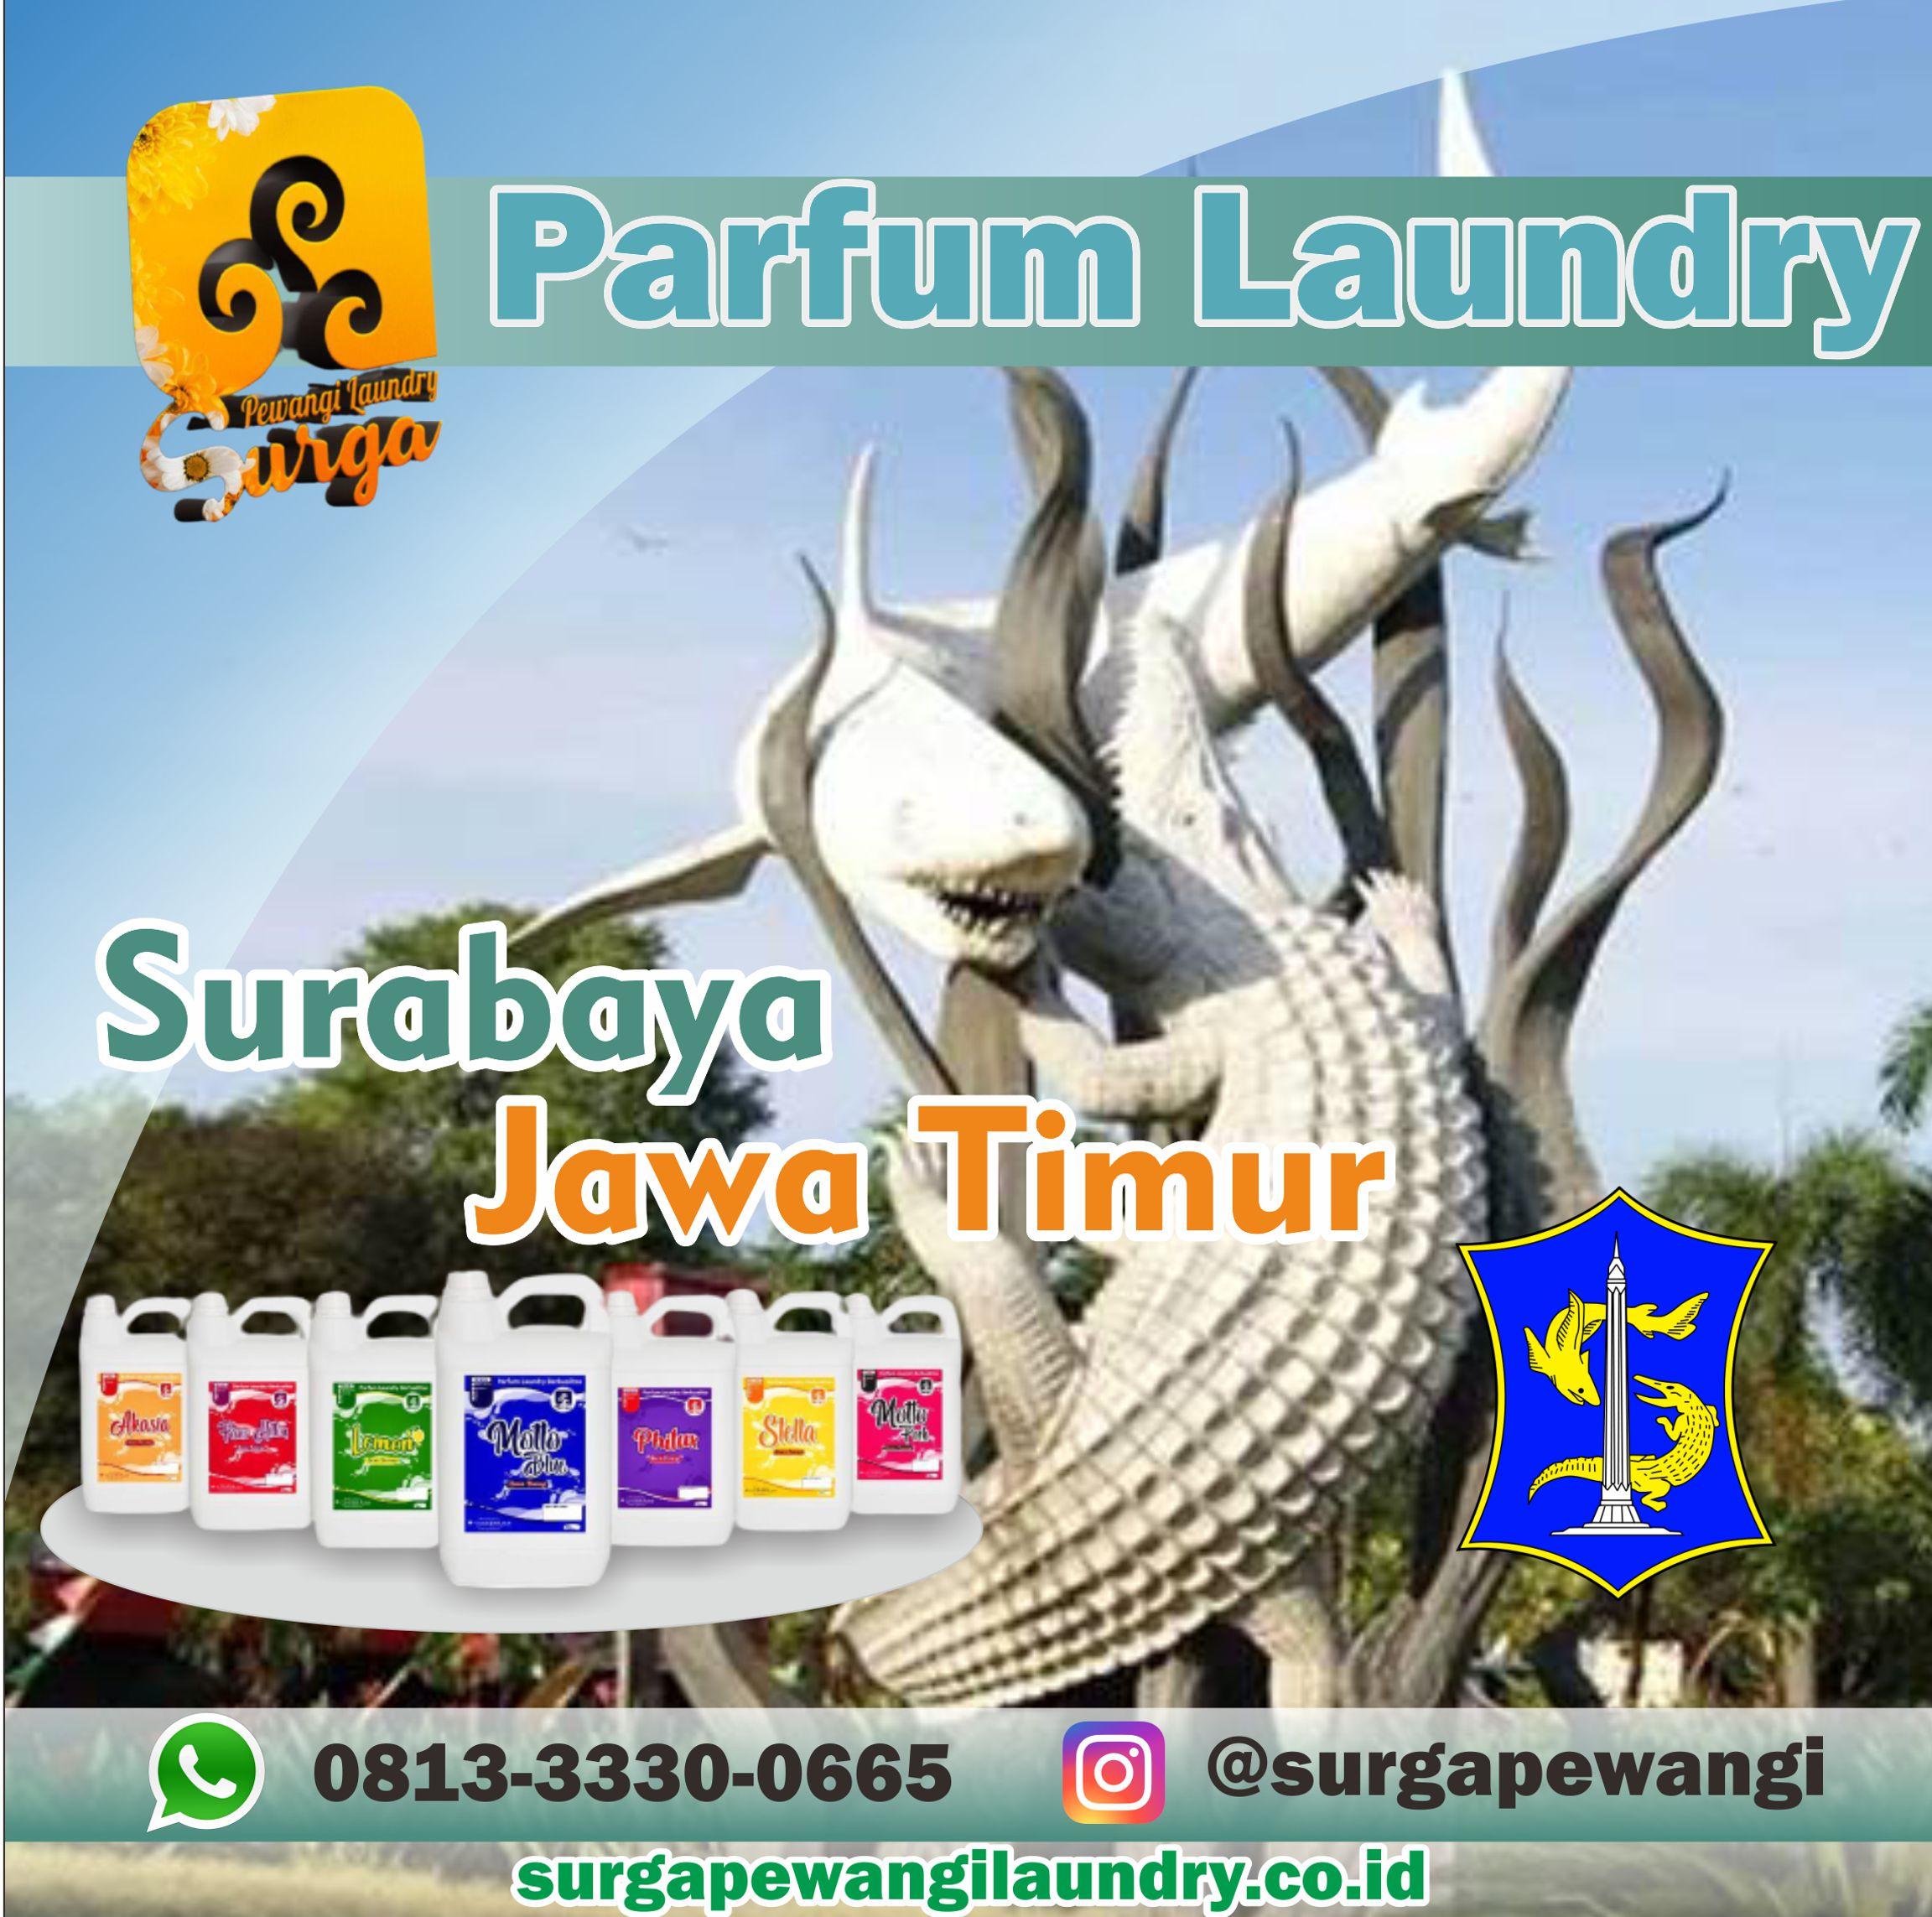 Parfum Laundry Surabaya